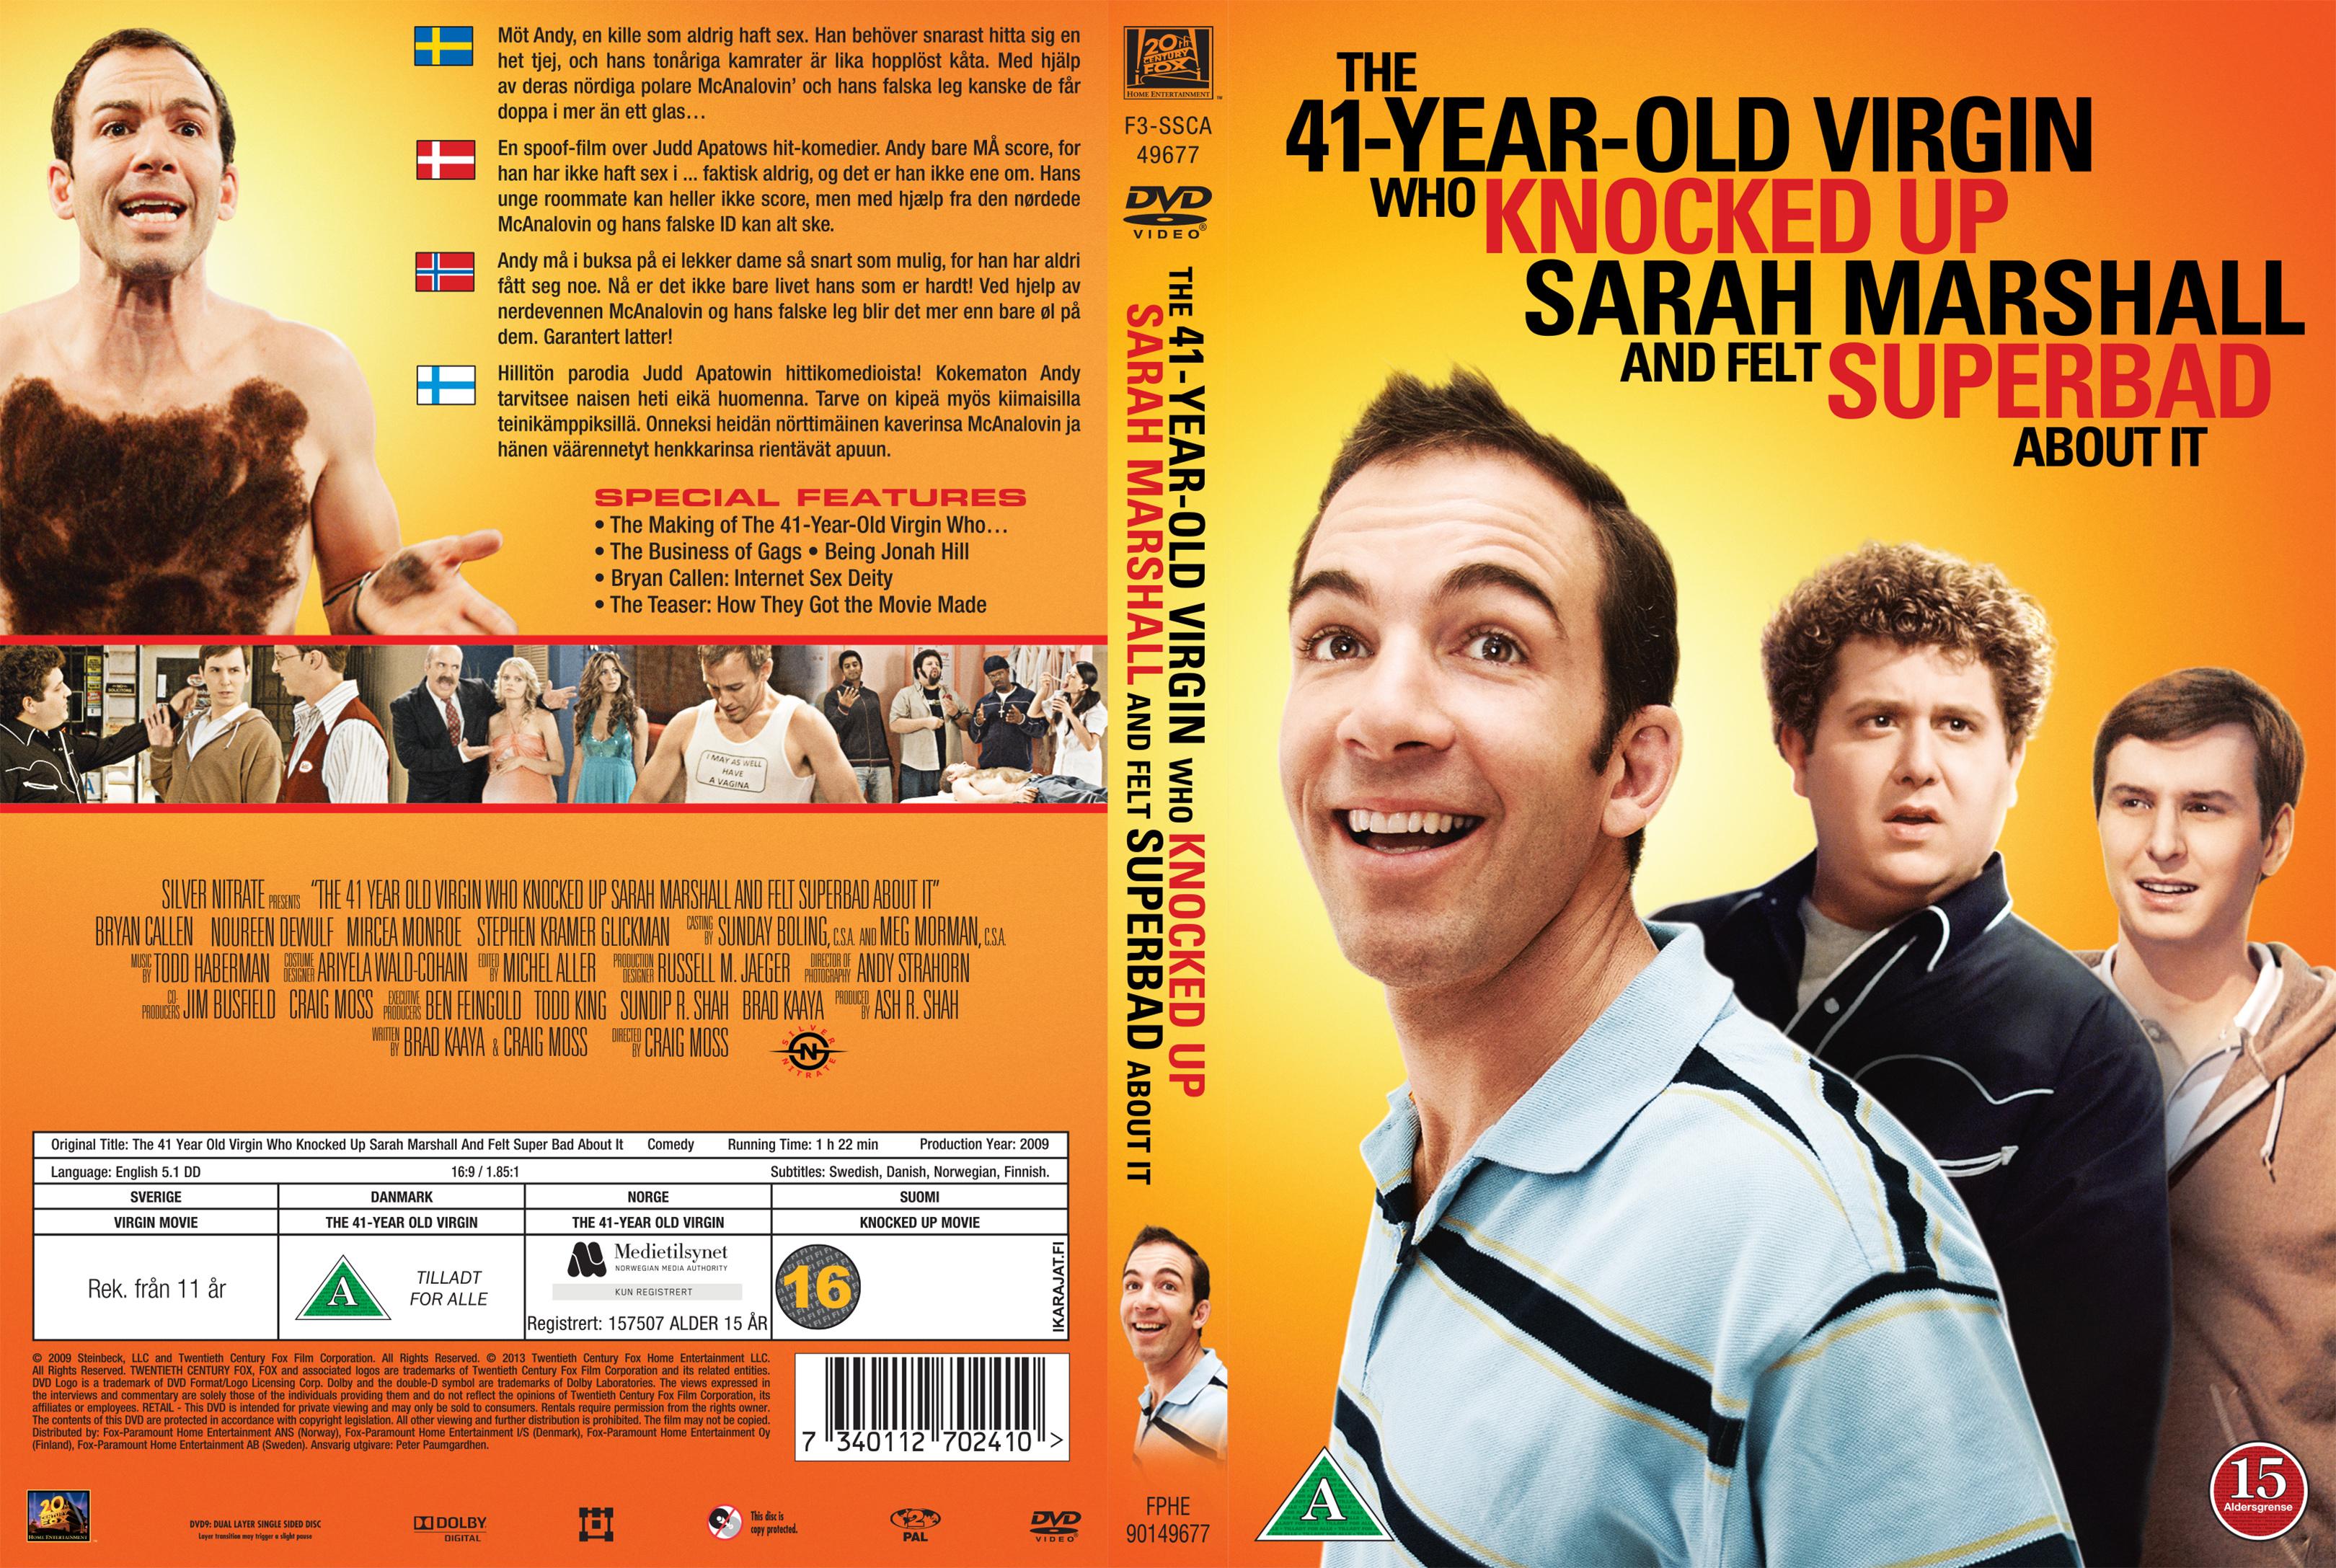 41 year old virgin who knocked up sarah marshall full movie